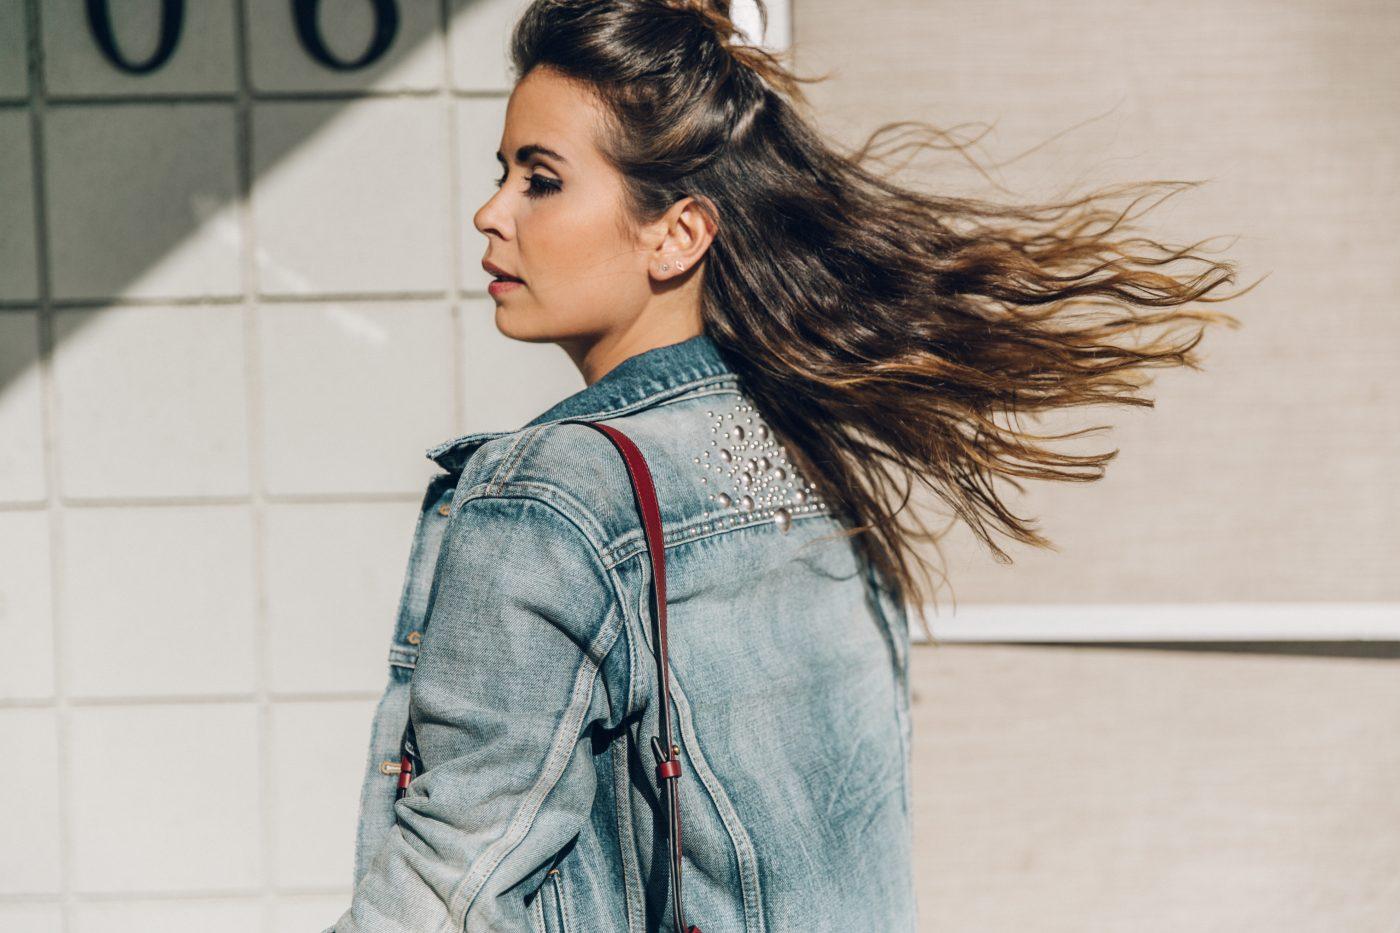 Denim_Jacket-Saint_Laurent-Chloe_Top-Suede_Skirt-Chloe_Hudson_Bag-Espadrilles-Coachella-Palm_Springs-Outfit-Collage_Vintage-25